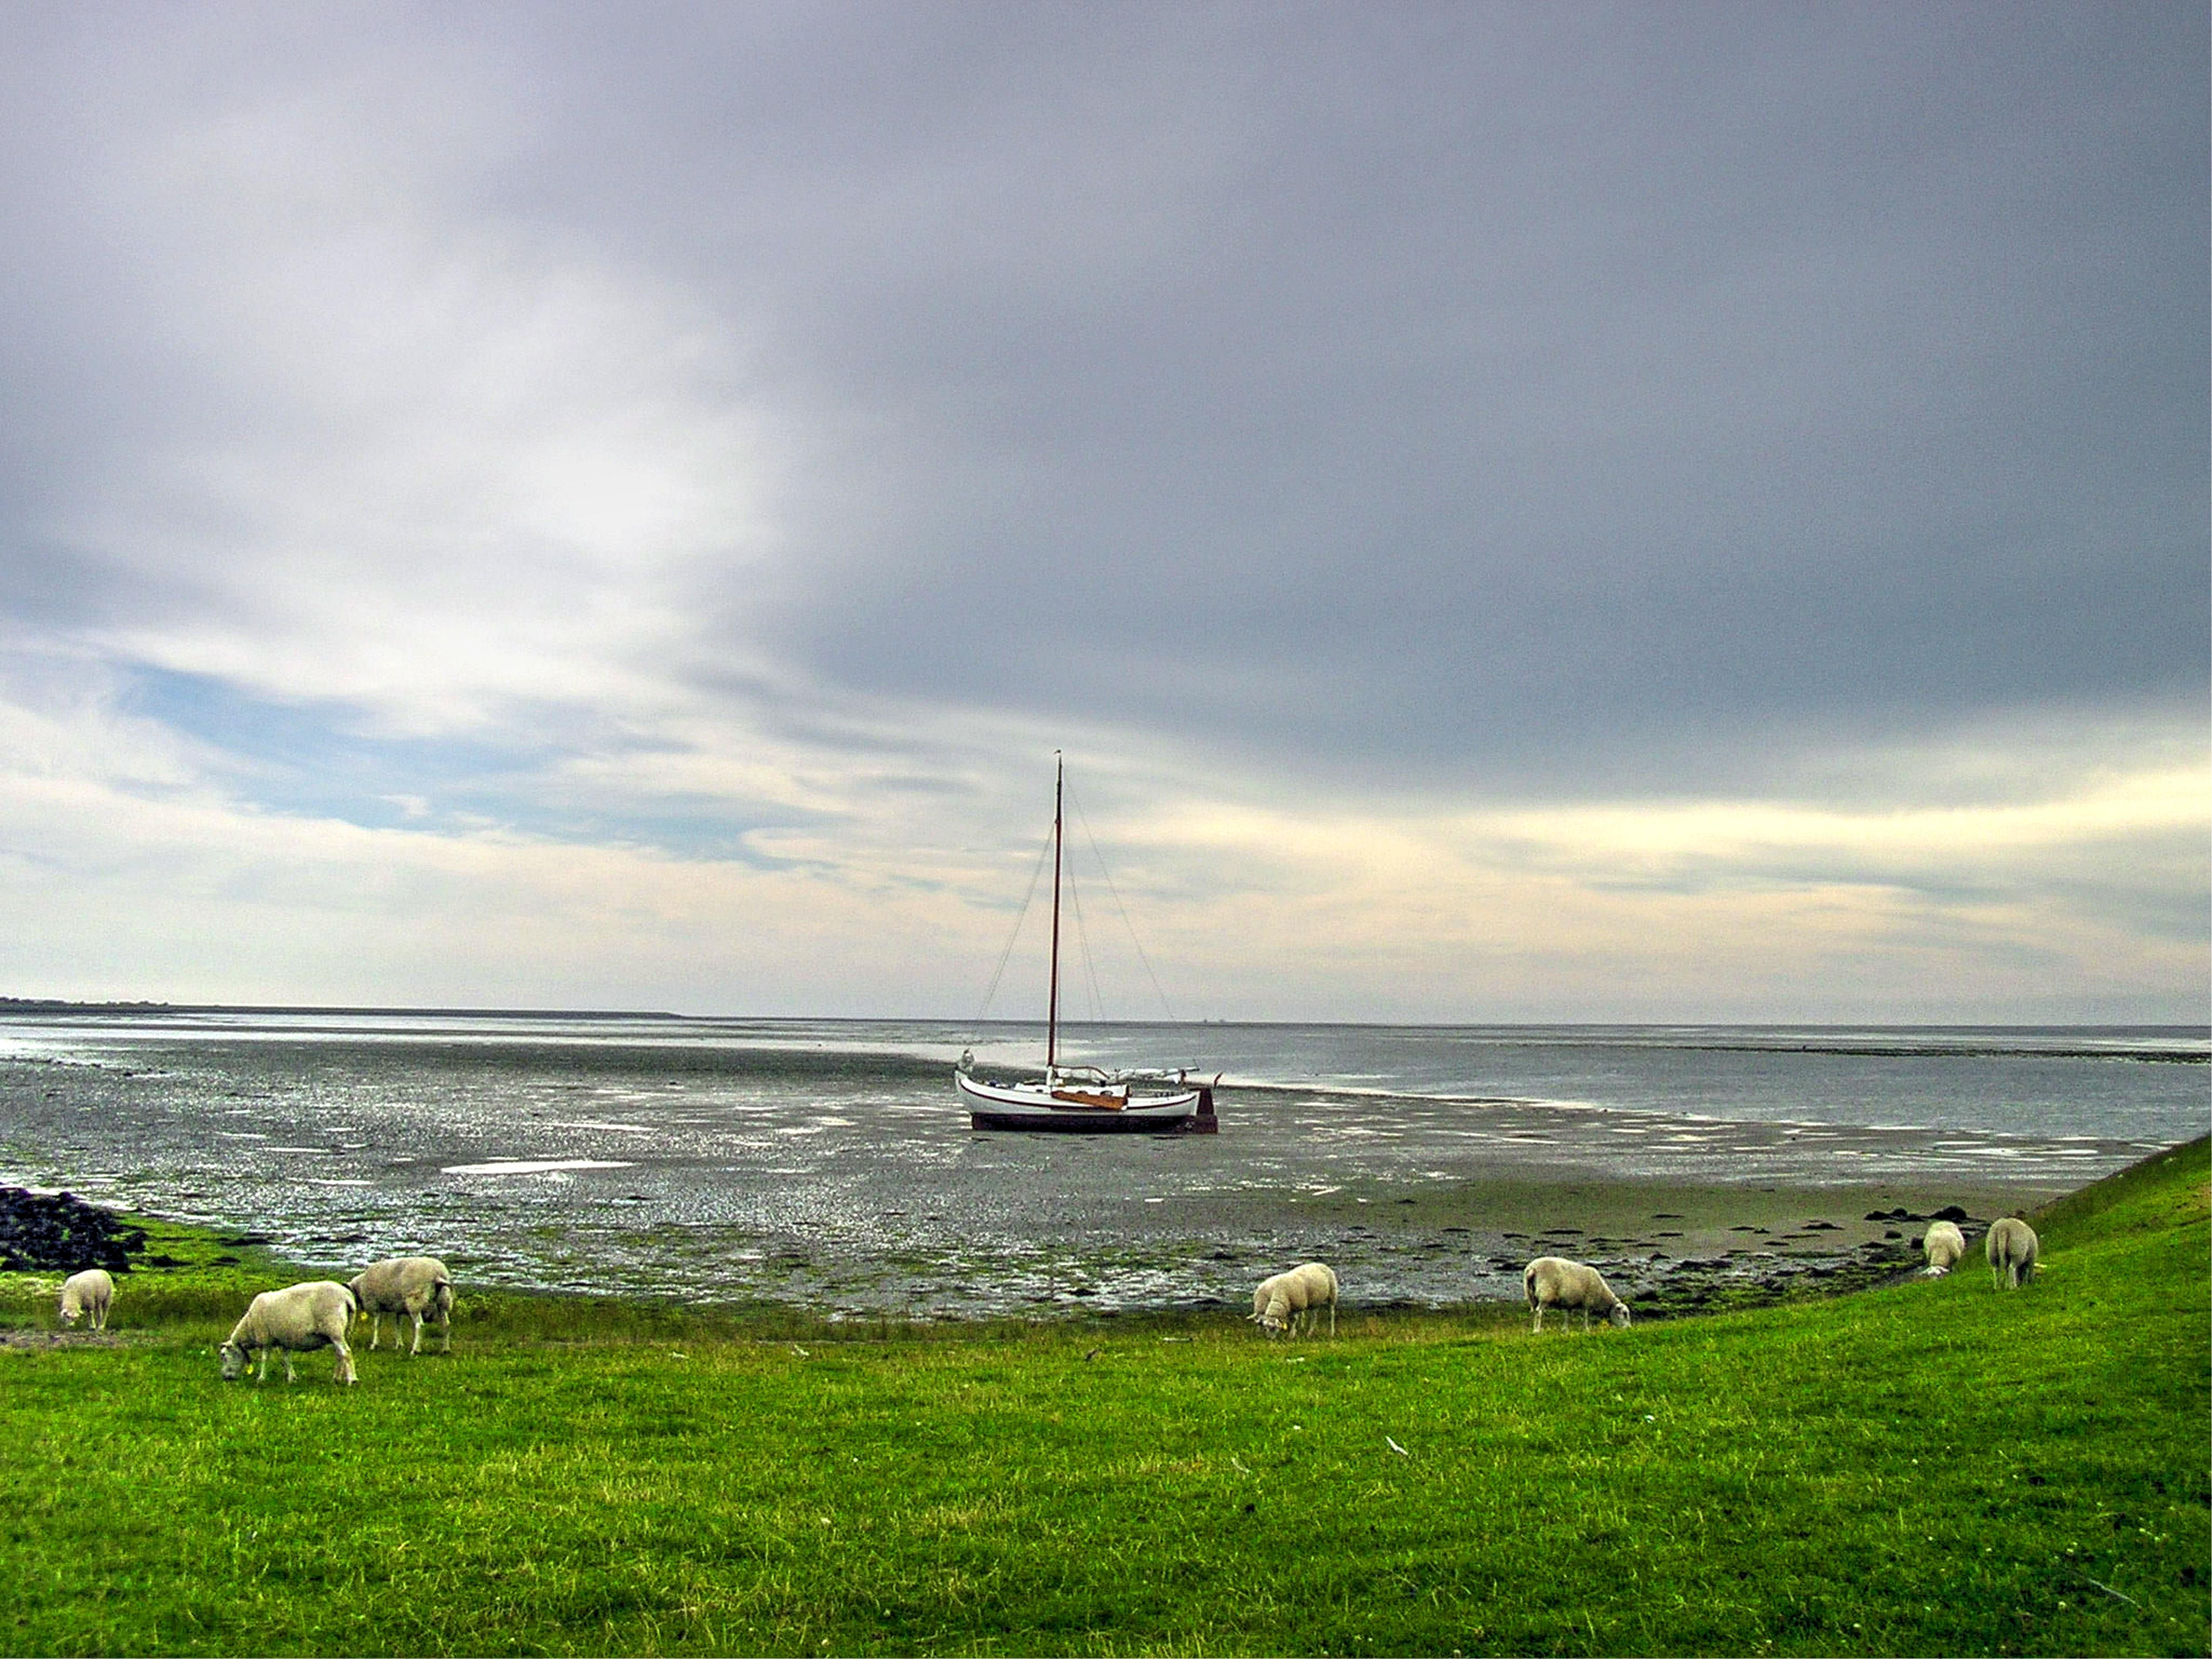 free images   beach  sea  coast  water  grass  ocean  horizon  cloud  sky  boat  field  farm